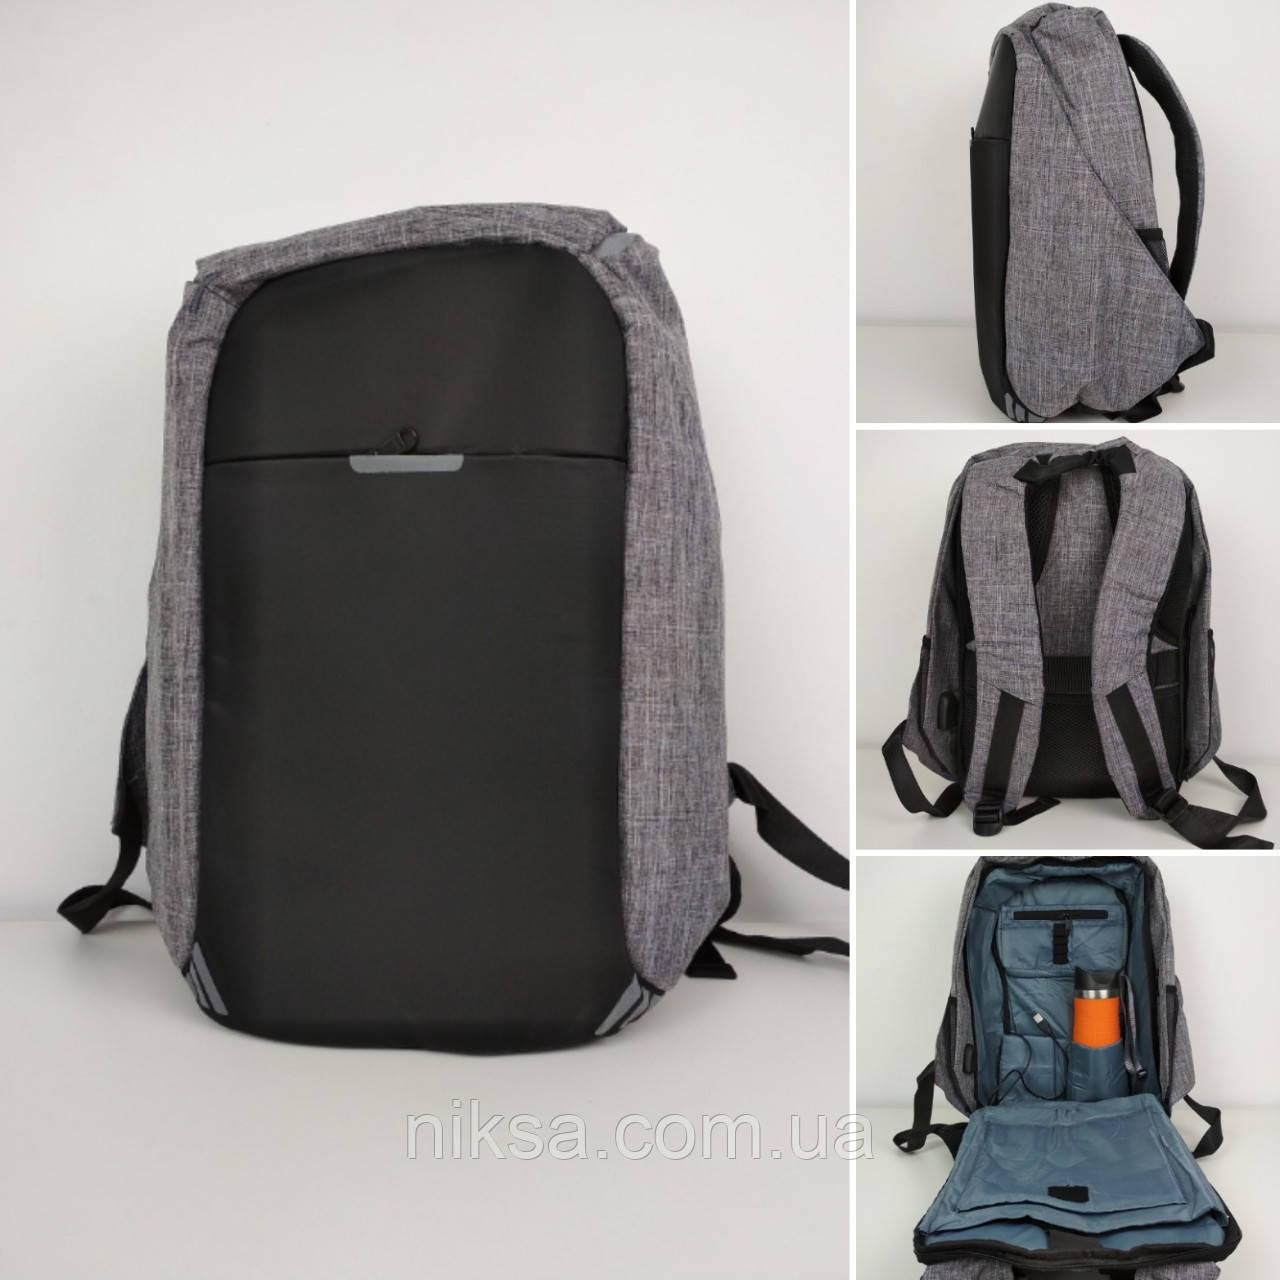 Рюкзак городской антивор с USB размер:45x30х20